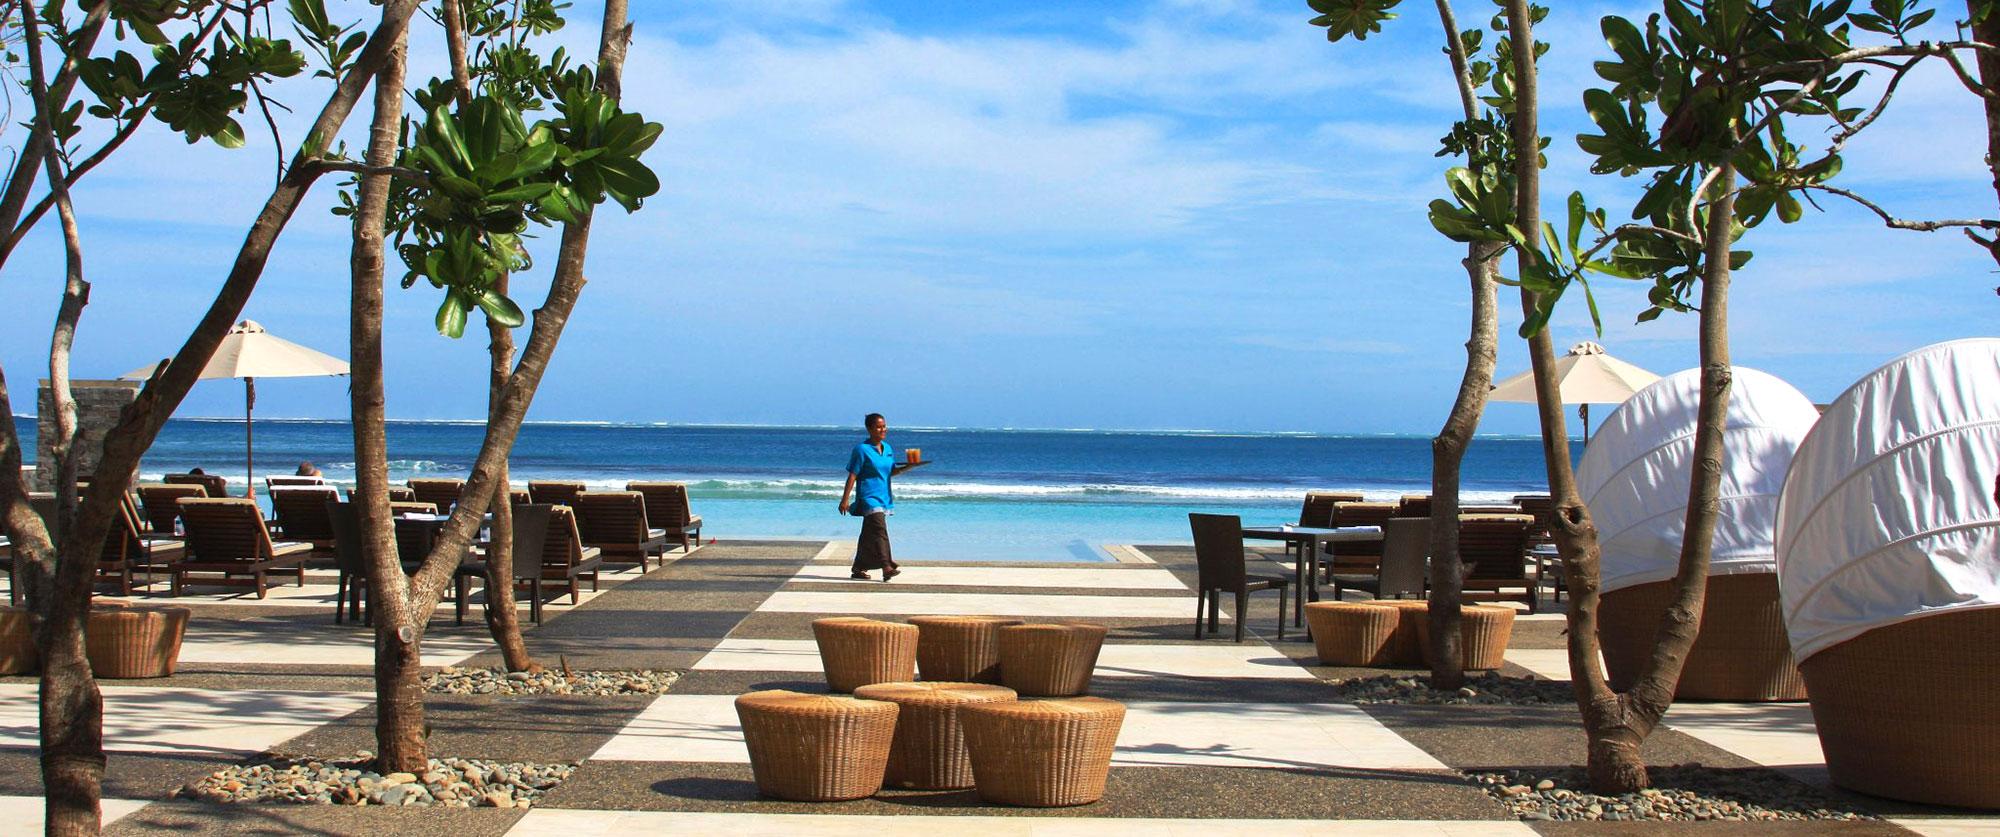 Fiji Family Getaway - InterContinental Fiji Golf Resort and Spa